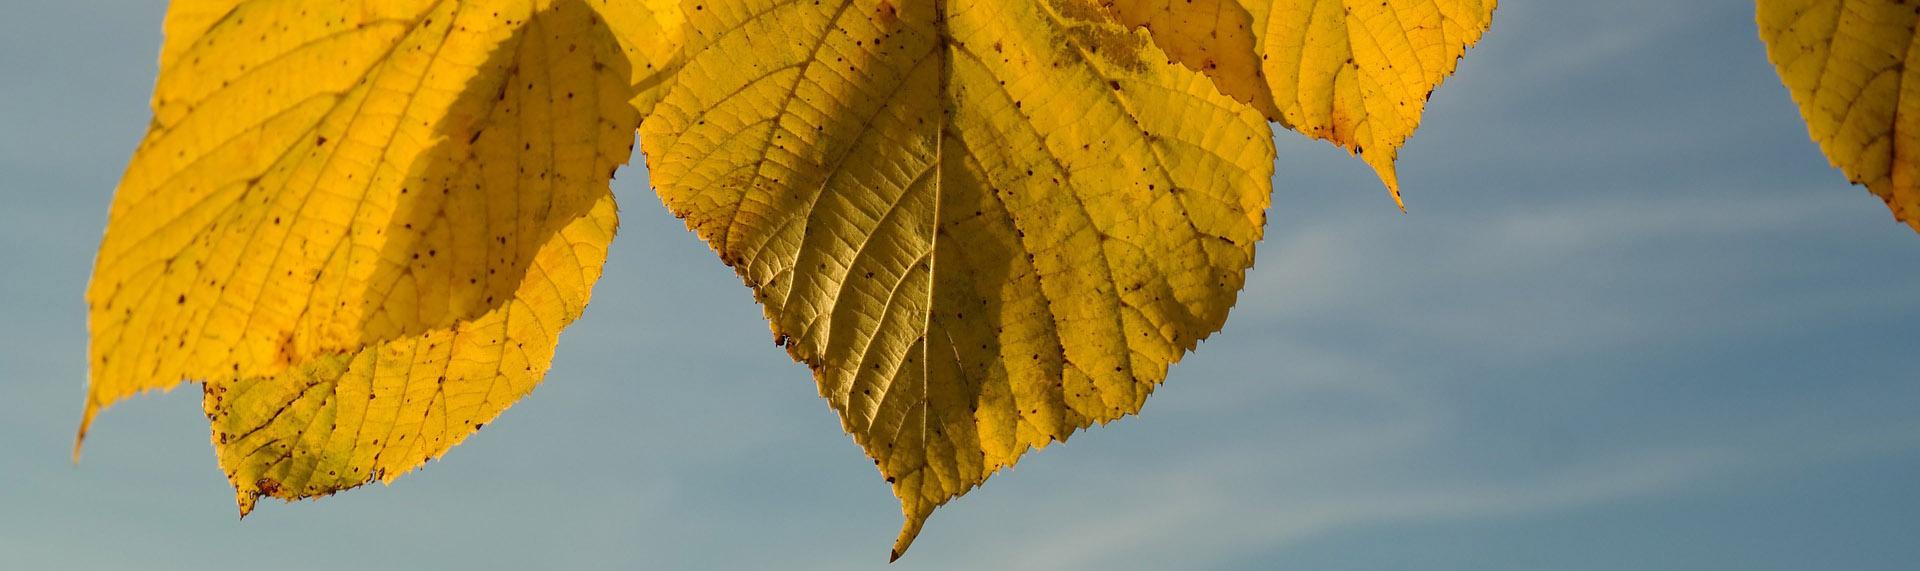 Stichting de Gele Linde